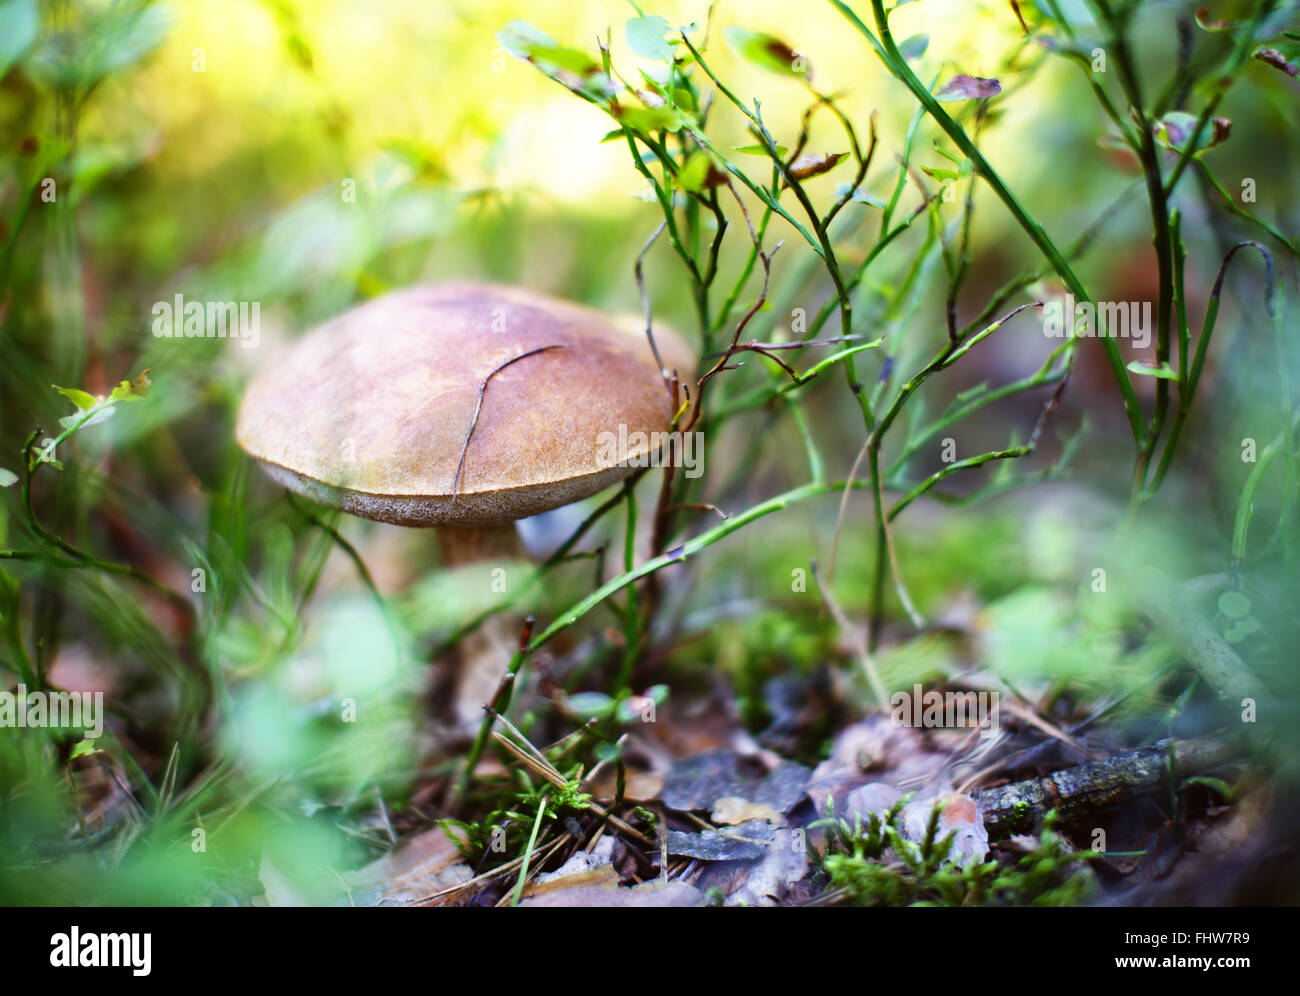 Boletus mushroom in forest. Gourmet vegetarian eating ingridient. Shallow depth of field - Stock Image